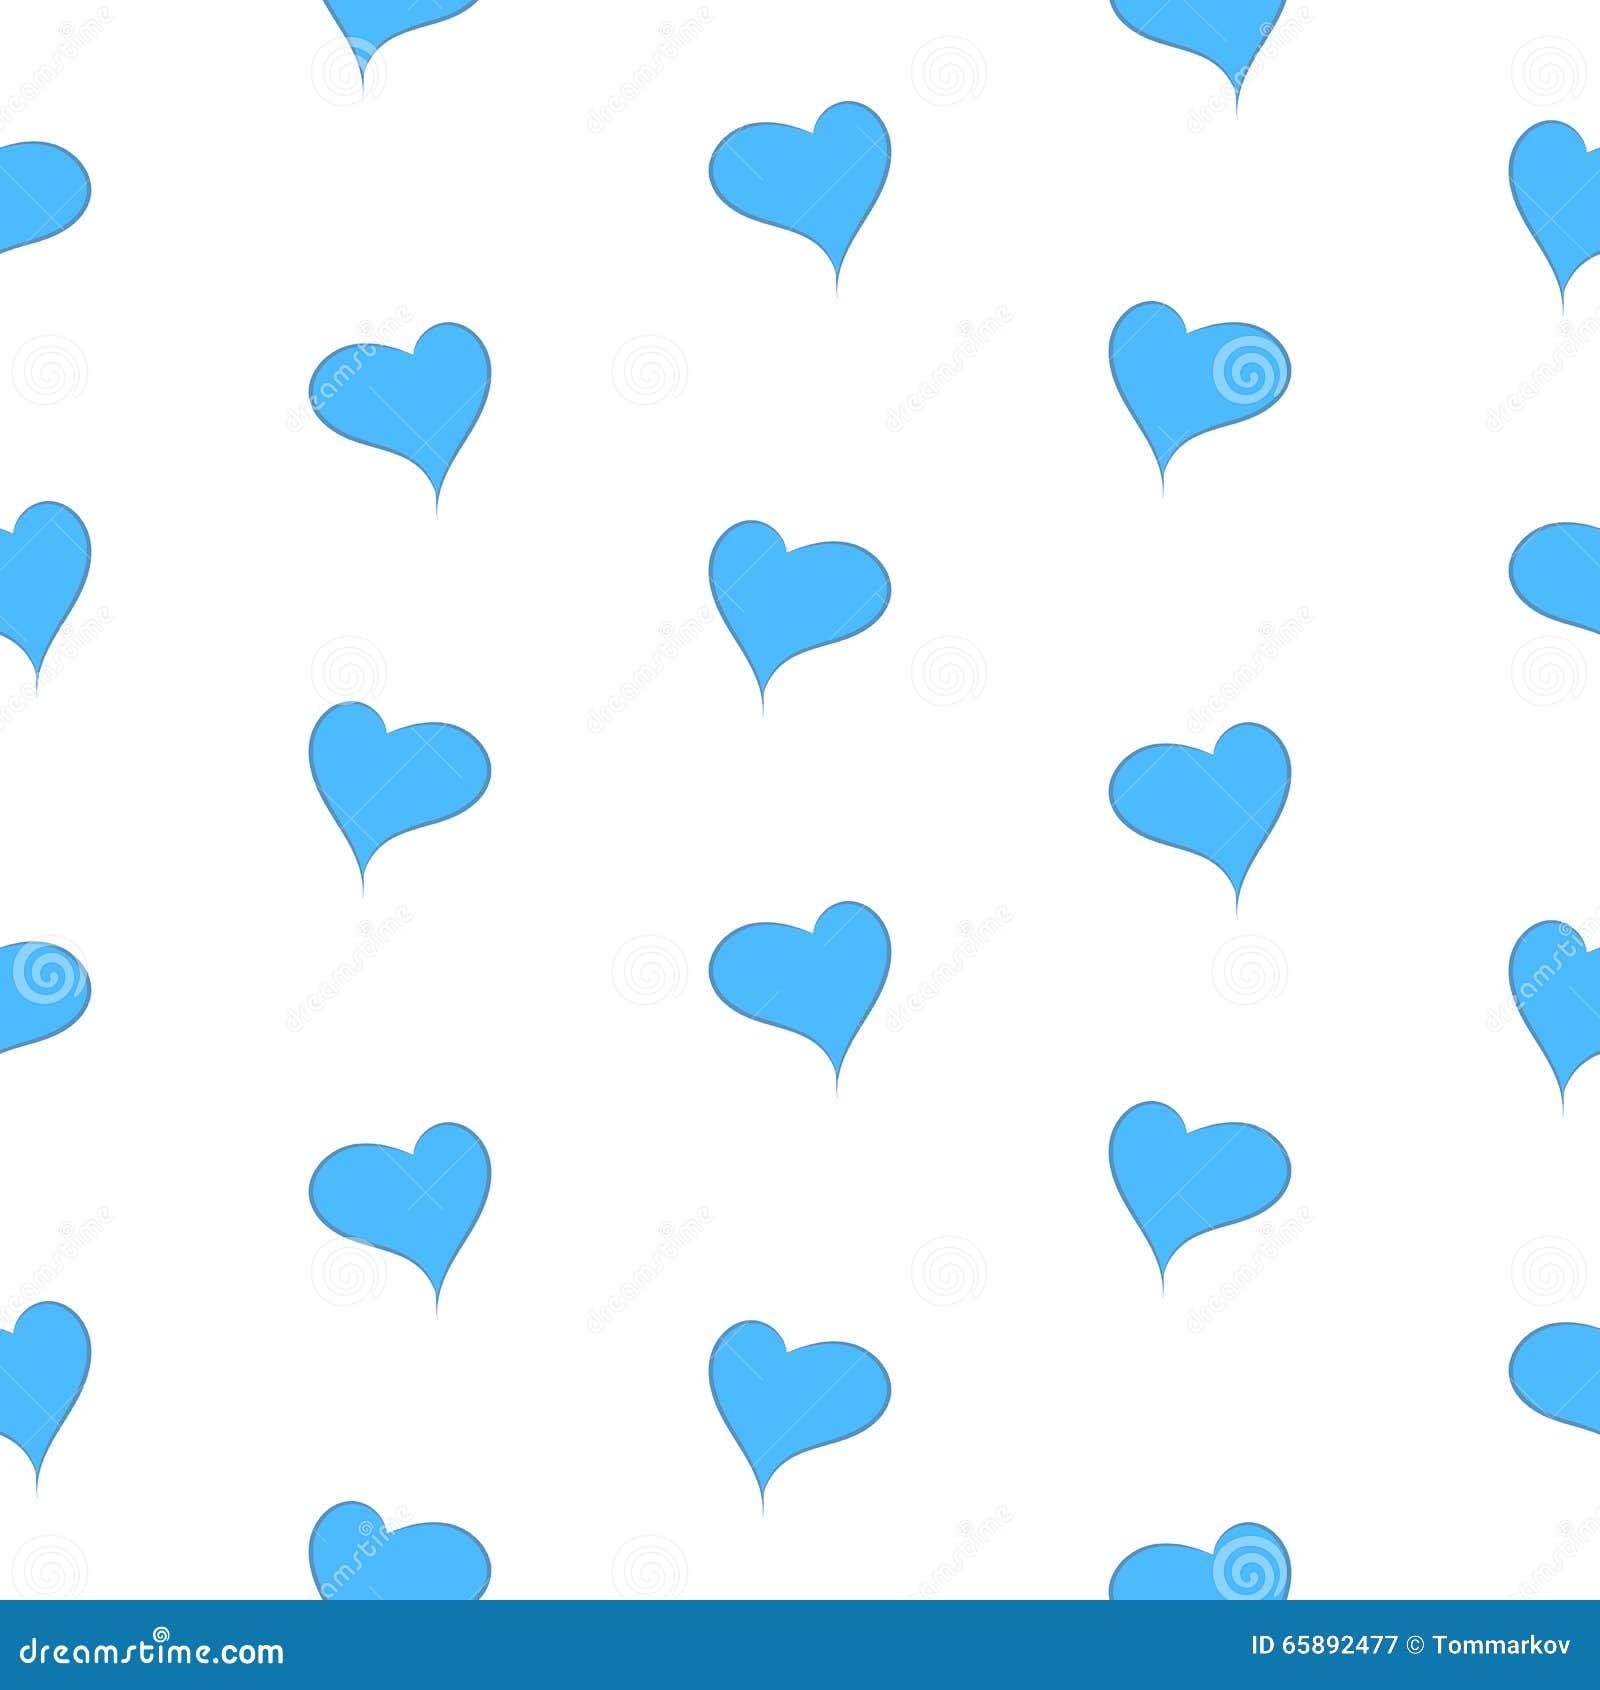 light blue heart background - photo #31